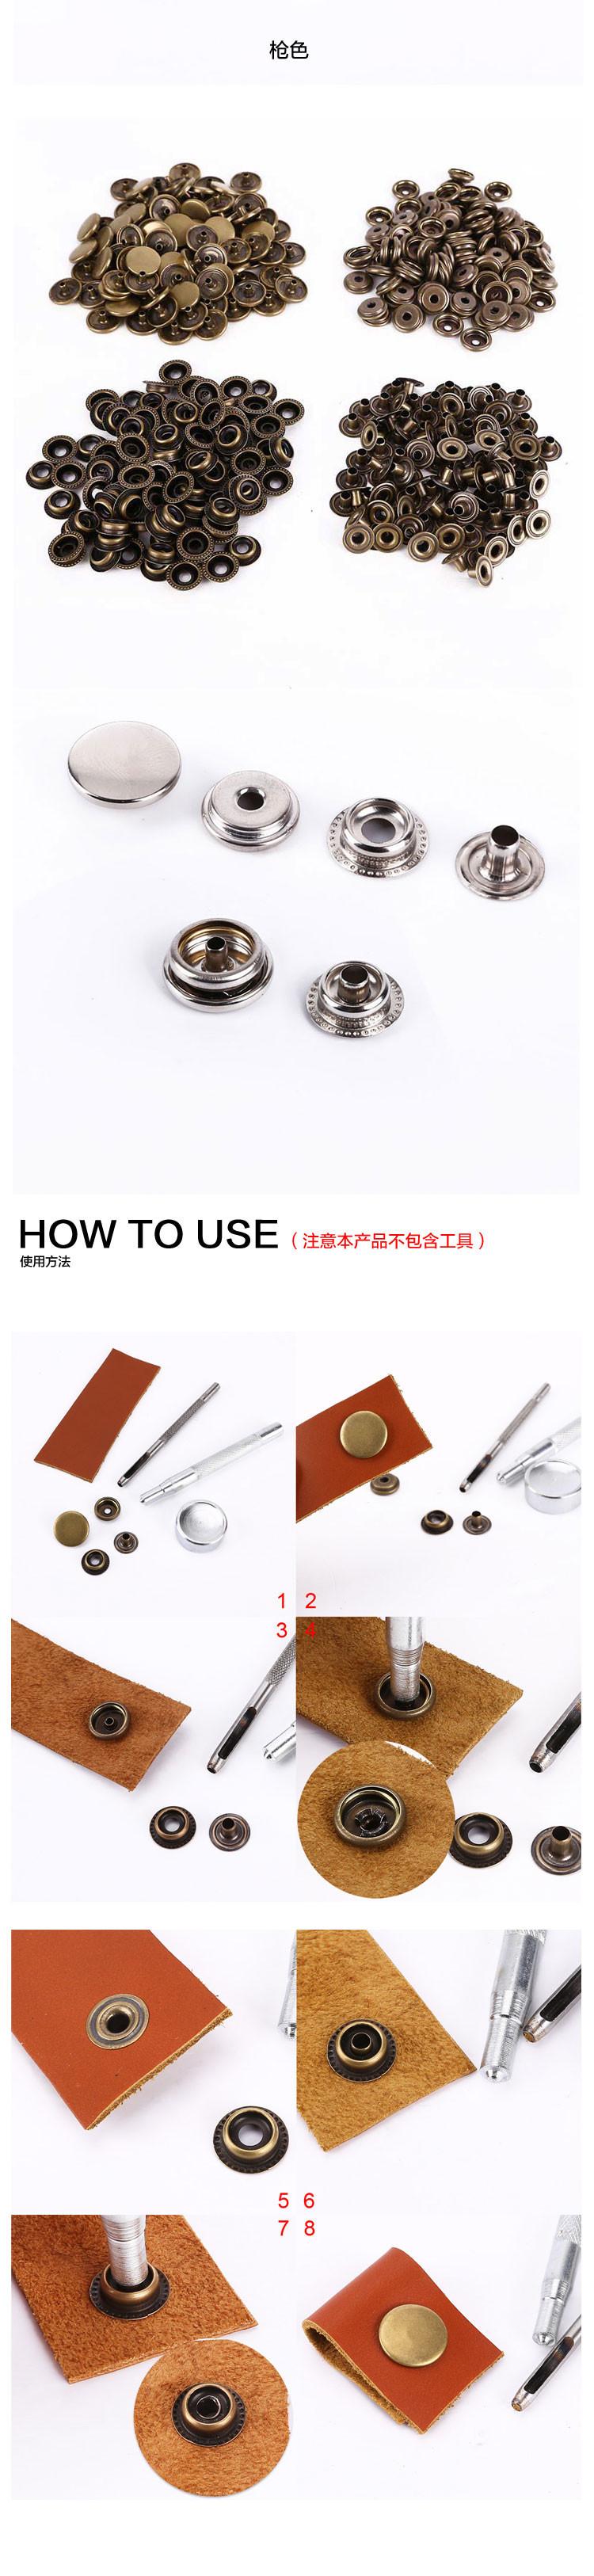 Aliexpress.com: Comprar 100set Botones a presión de Metal snaps Corchete…